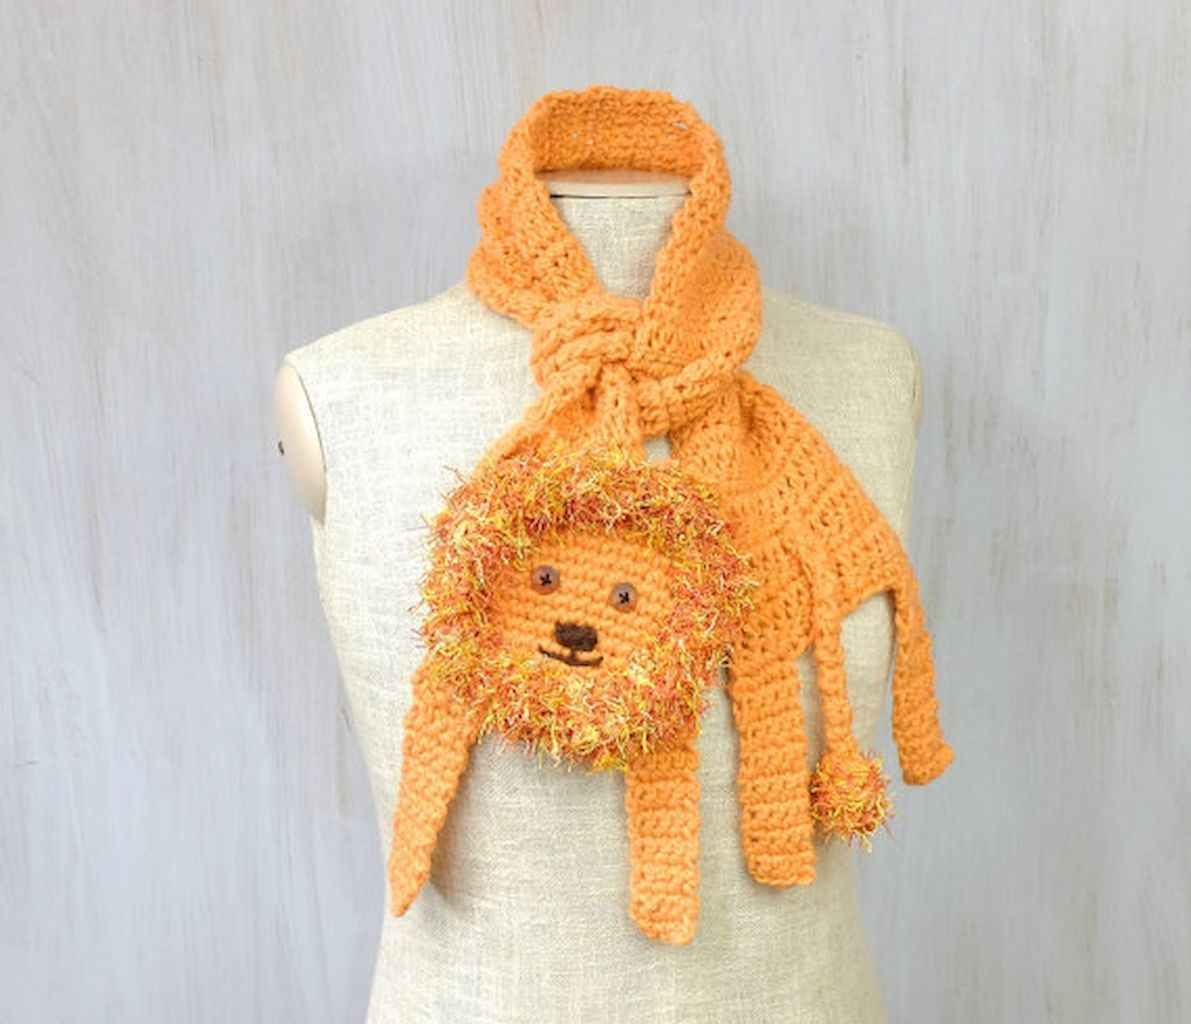 50 easy diy crochet animal scarf ideas for beginner (23)